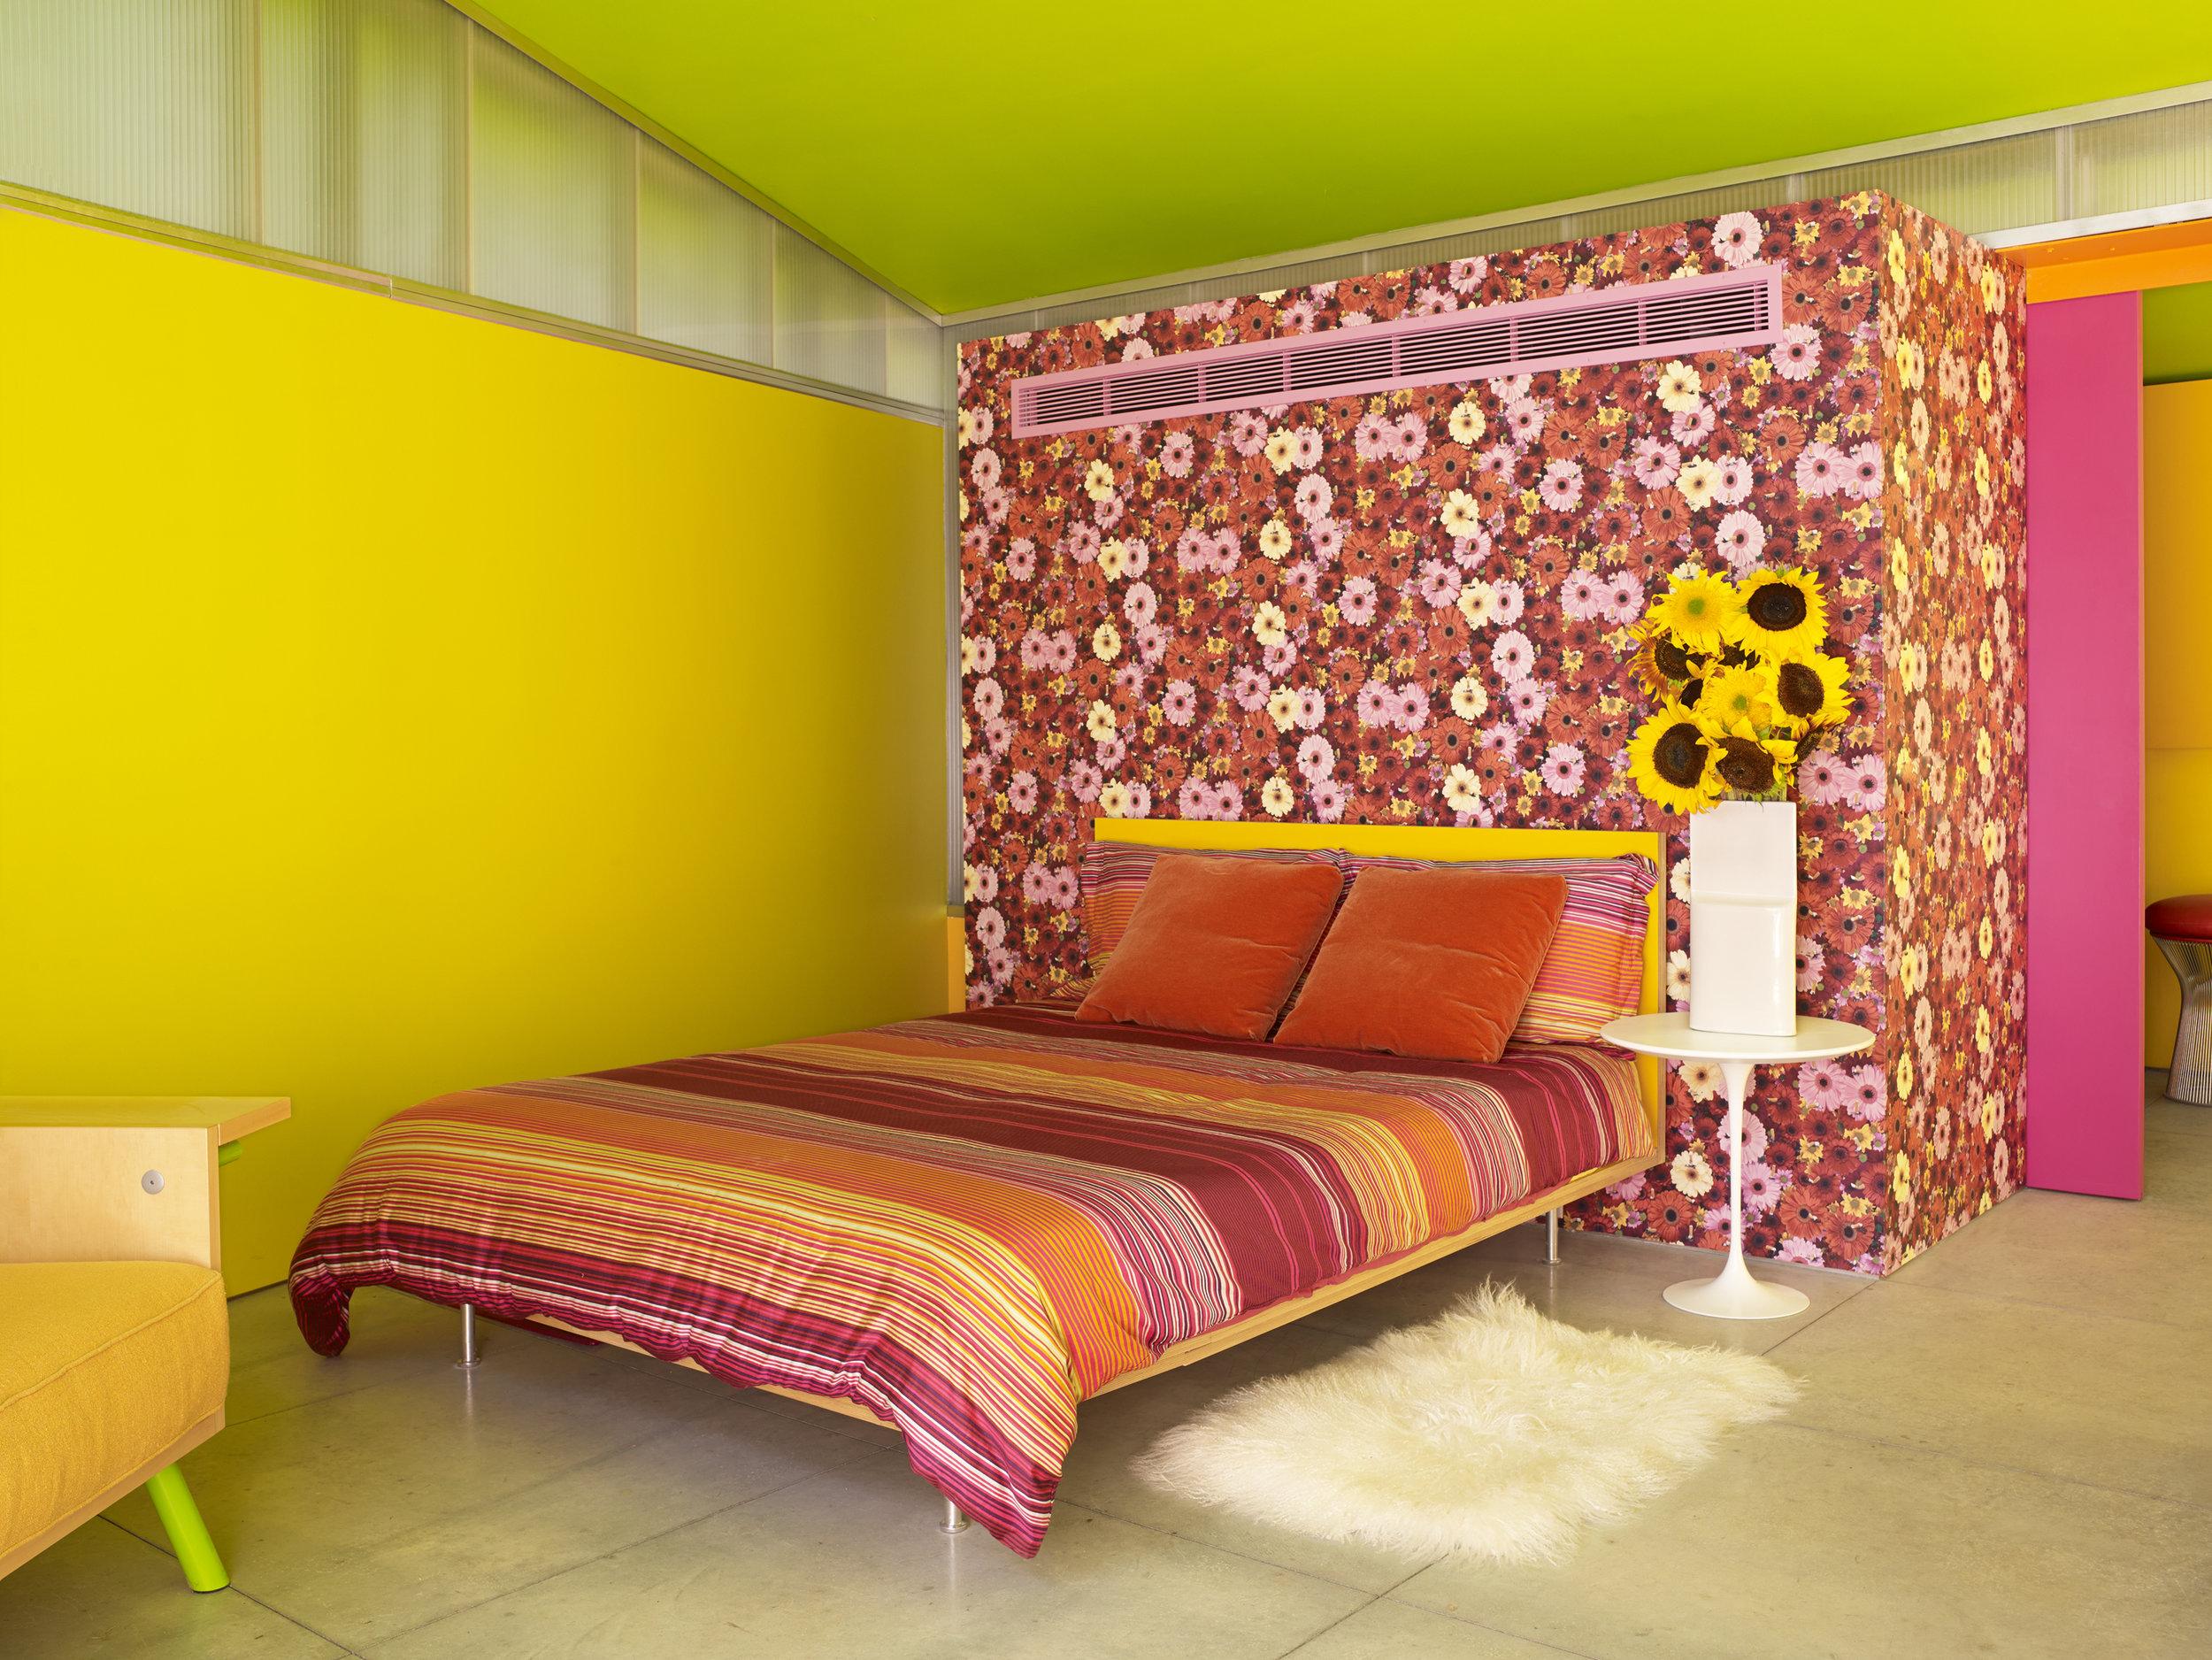 34 Stamberg-Guest Bed_006.jpg